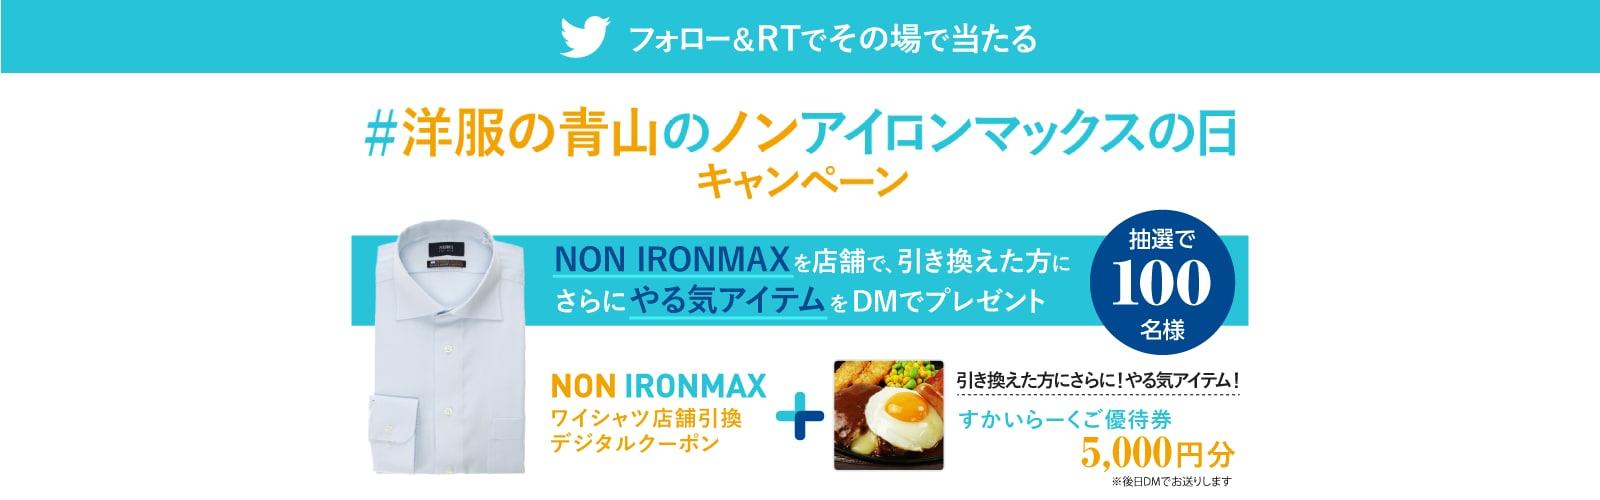 NONIRONMAX